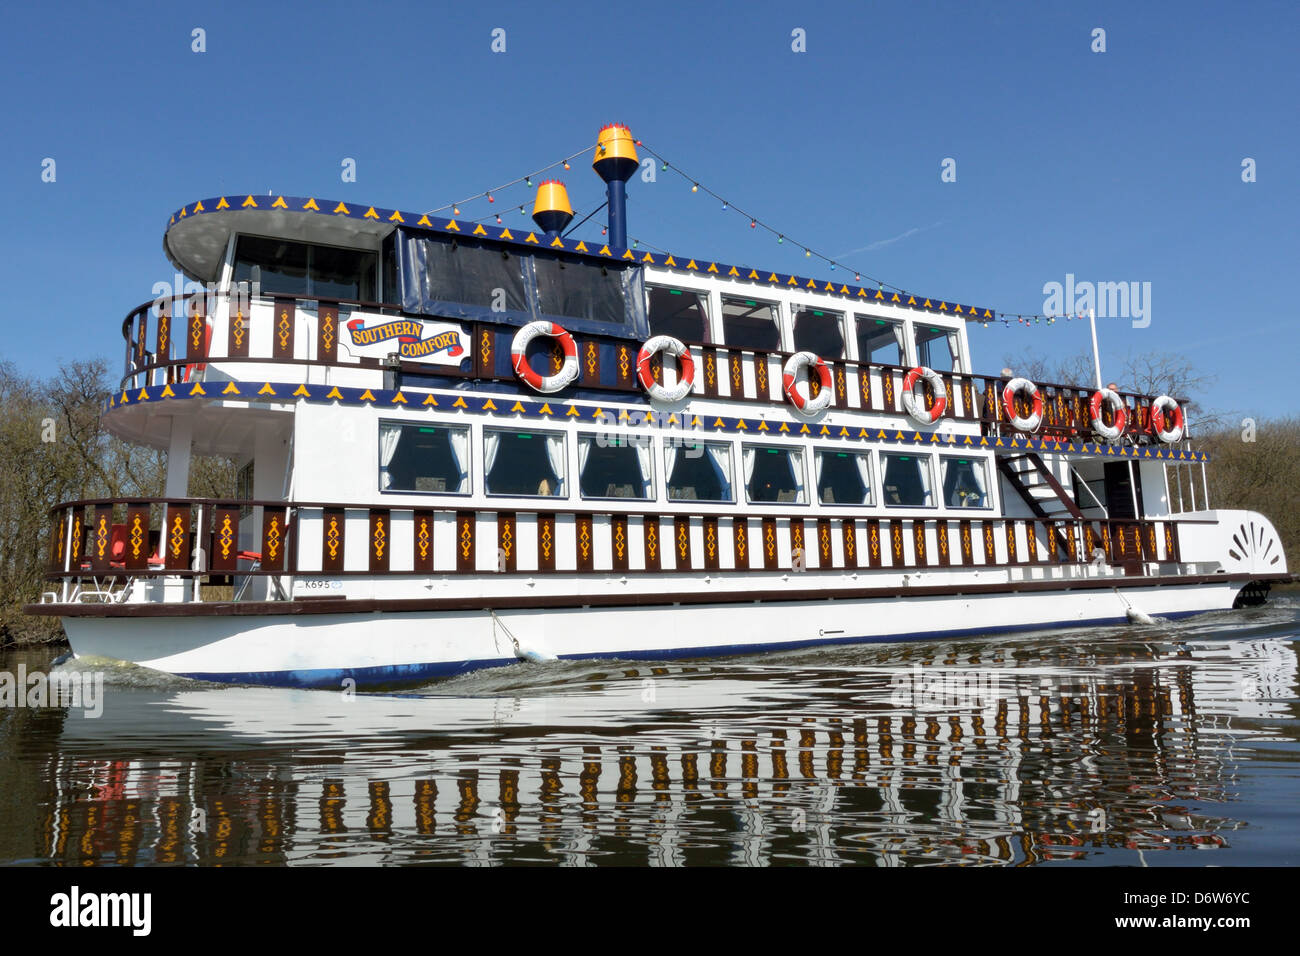 Memphis Paddle Boat Tours